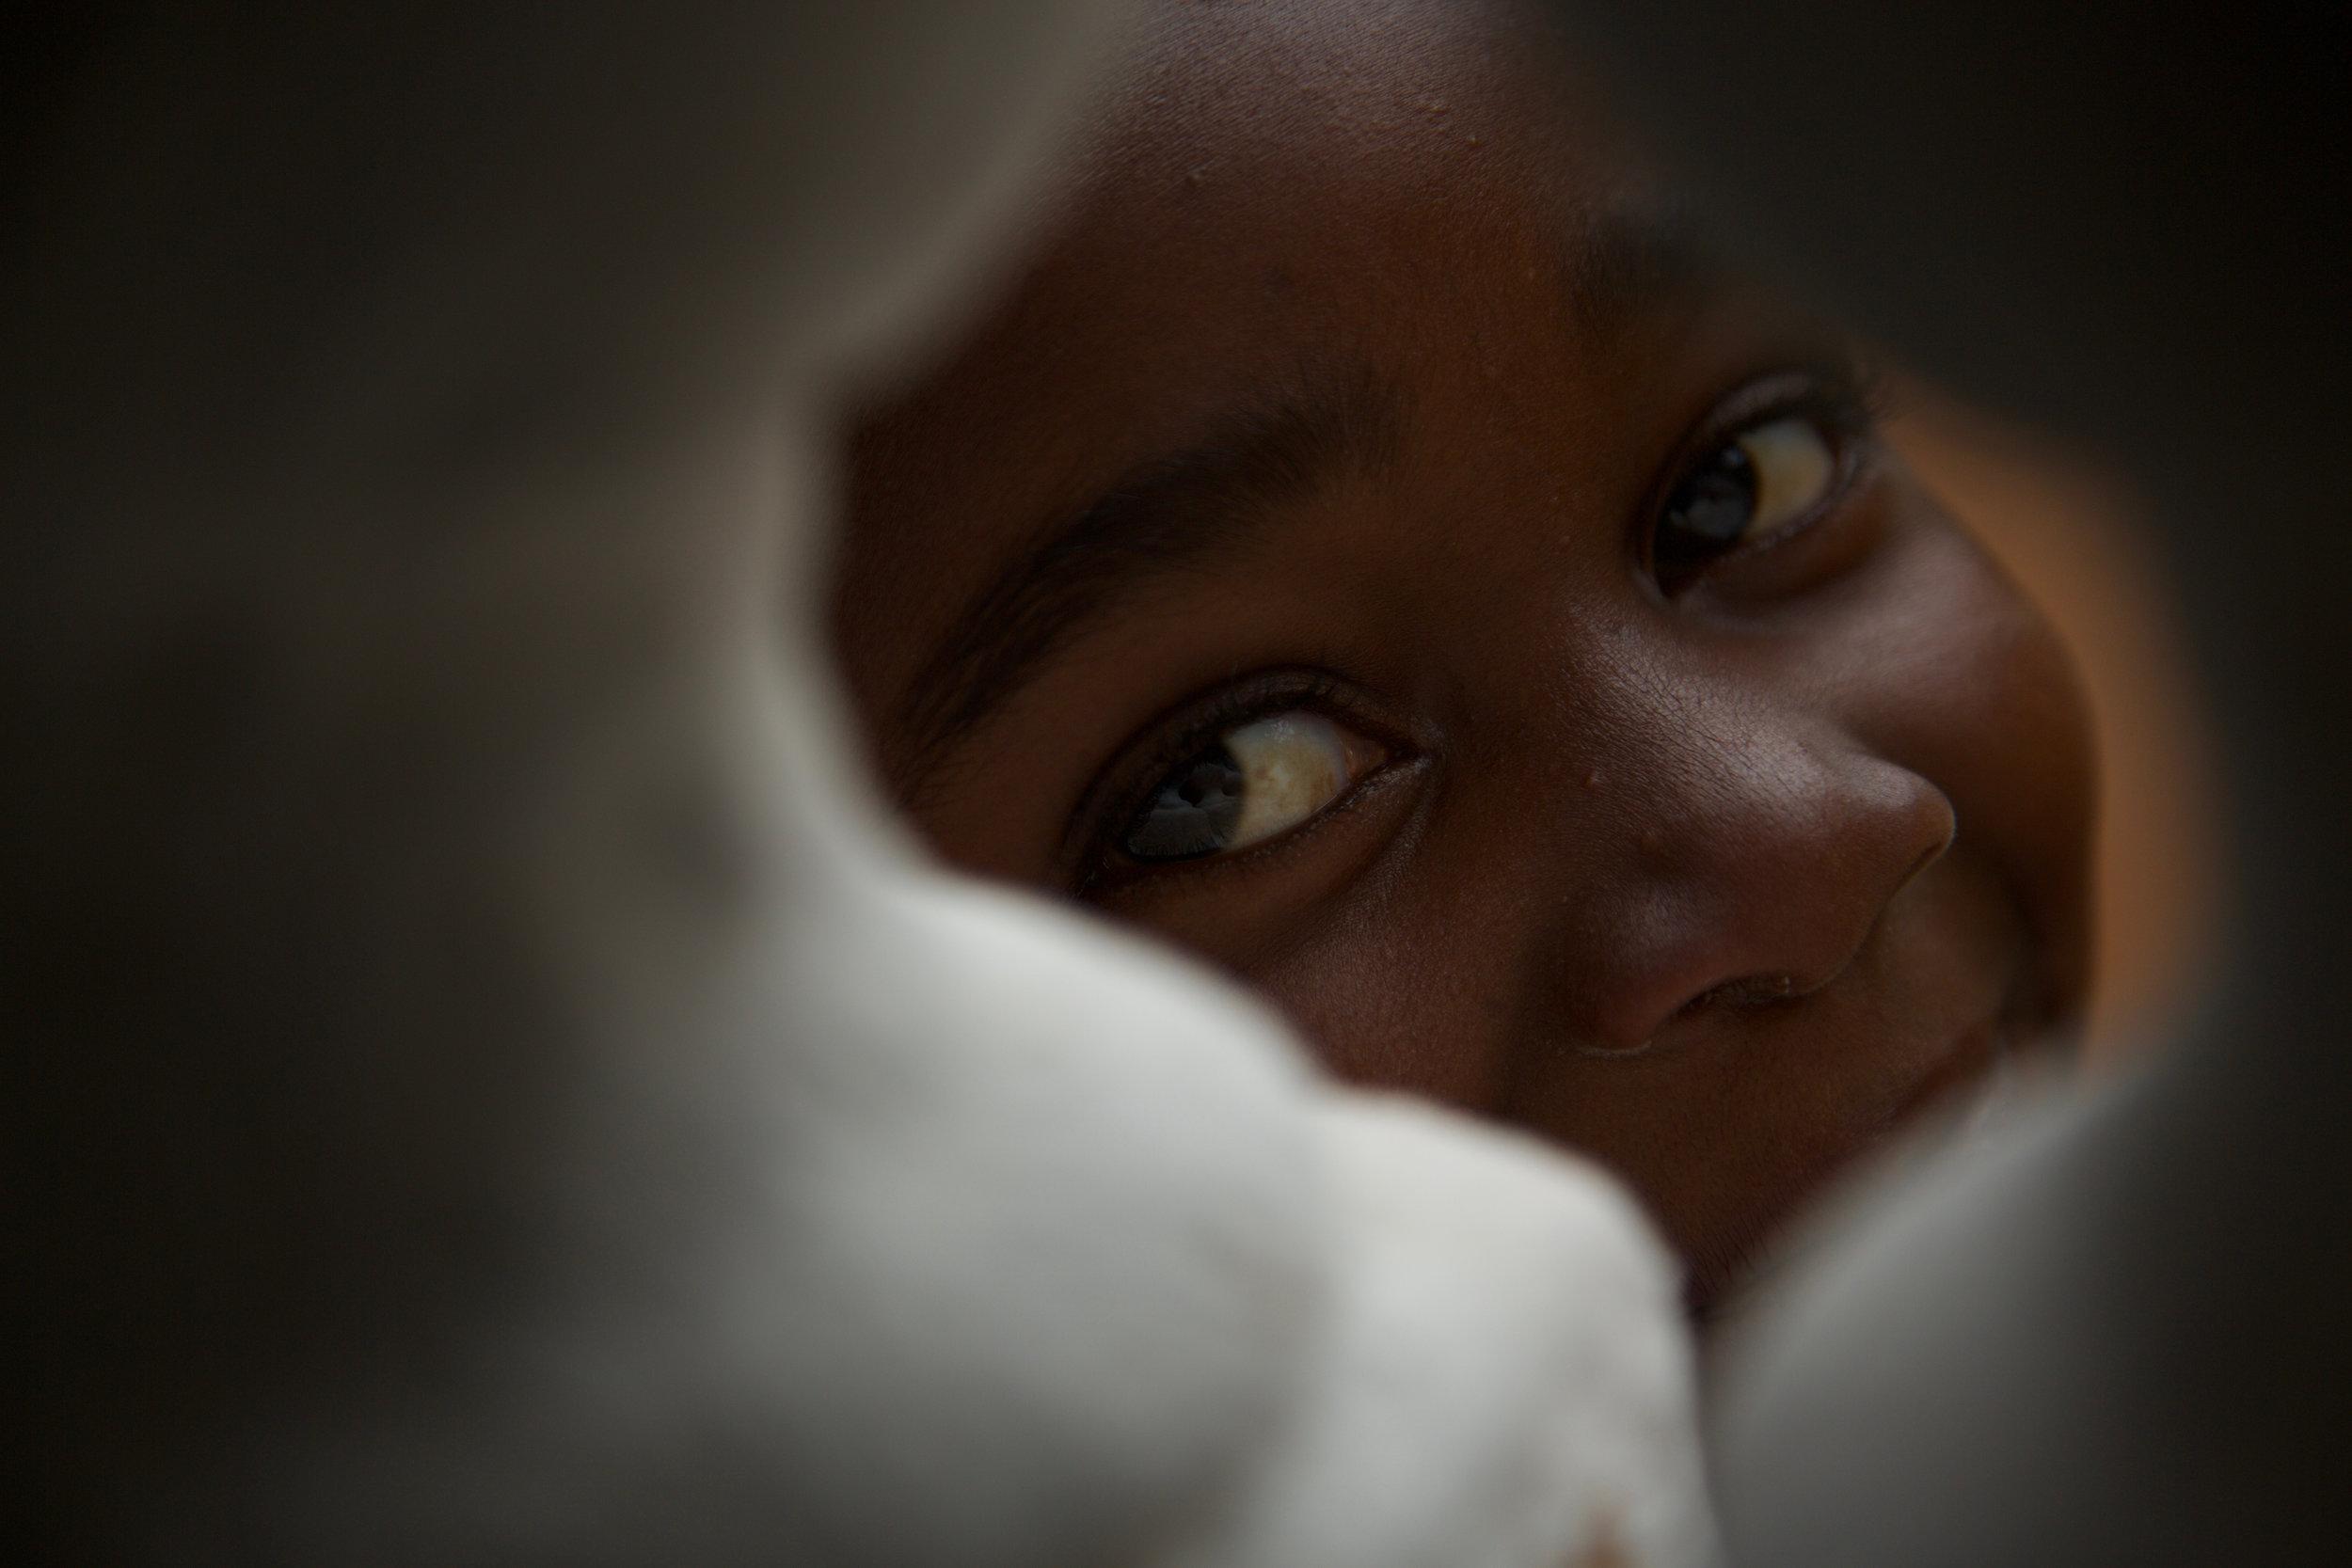 Haitian child looking at camera